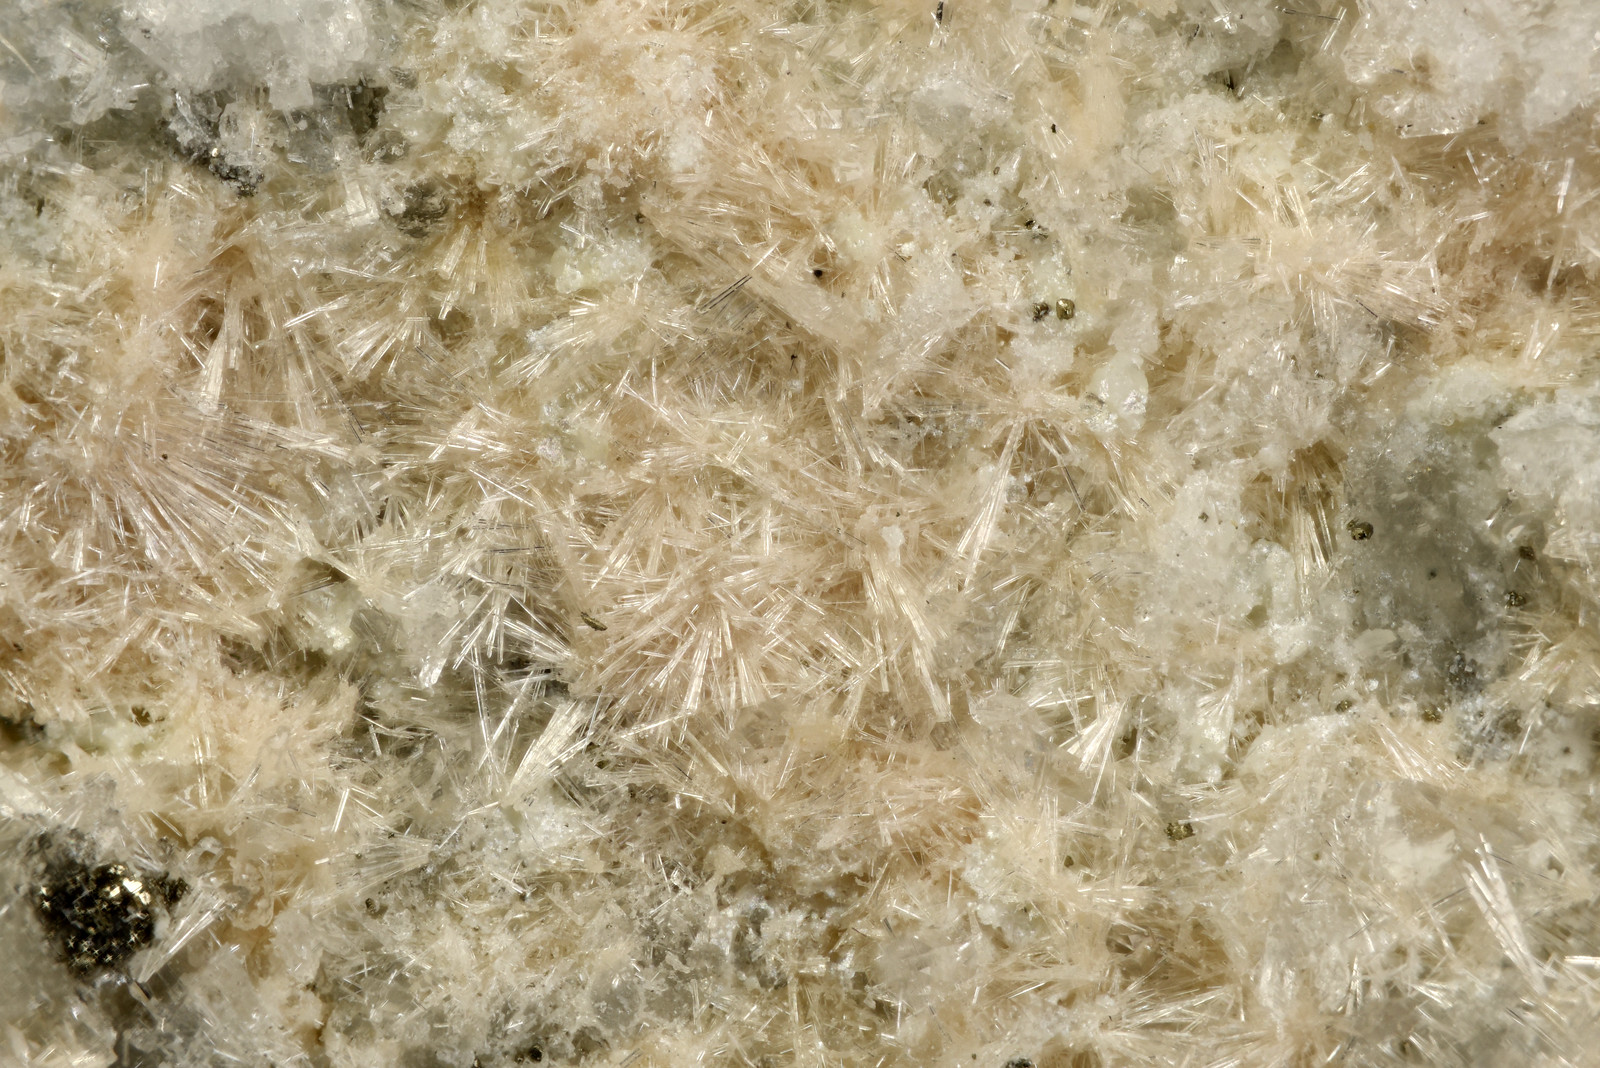 単斜灰簾石 / Clinozoisite